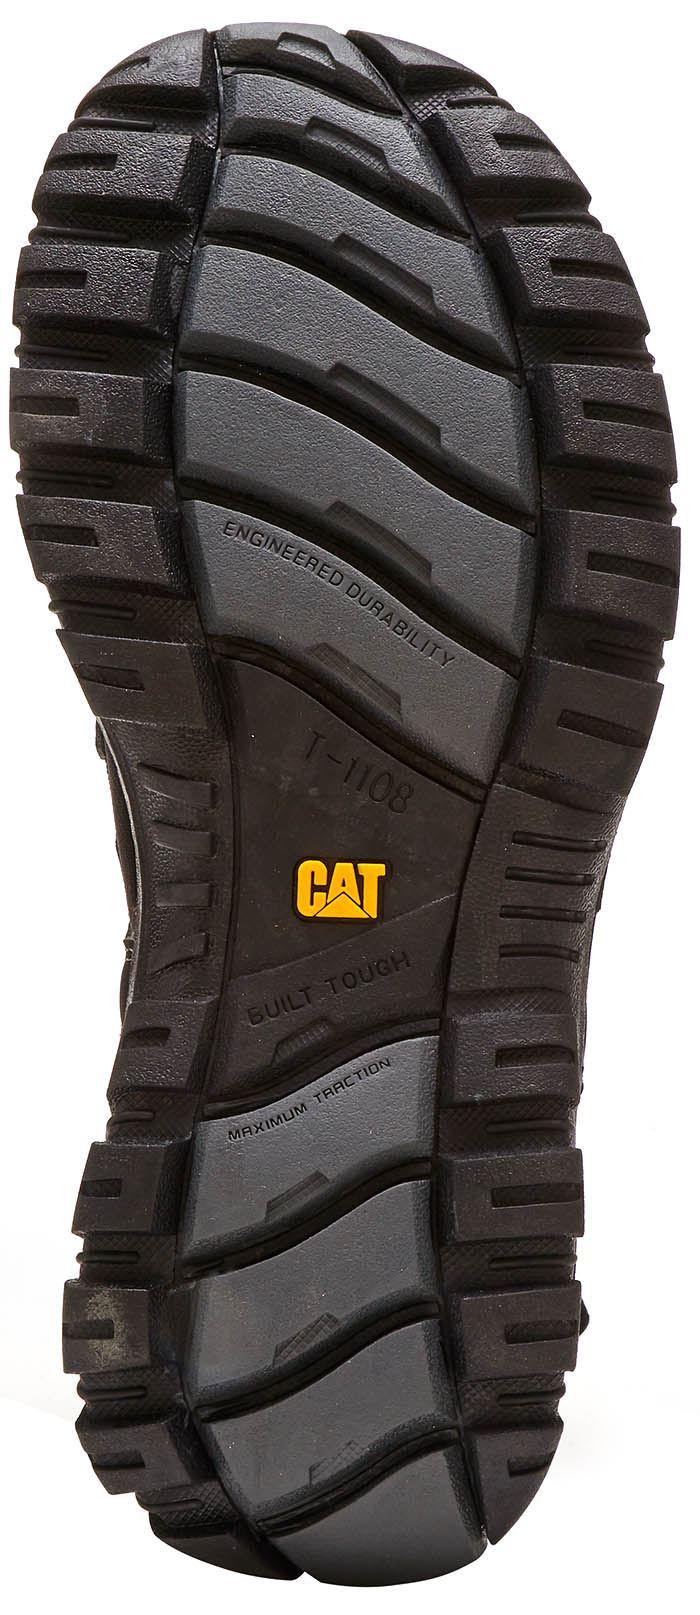 Caterpillar Giles CAT Leather Sandals in in in Marronee & nero 171c03